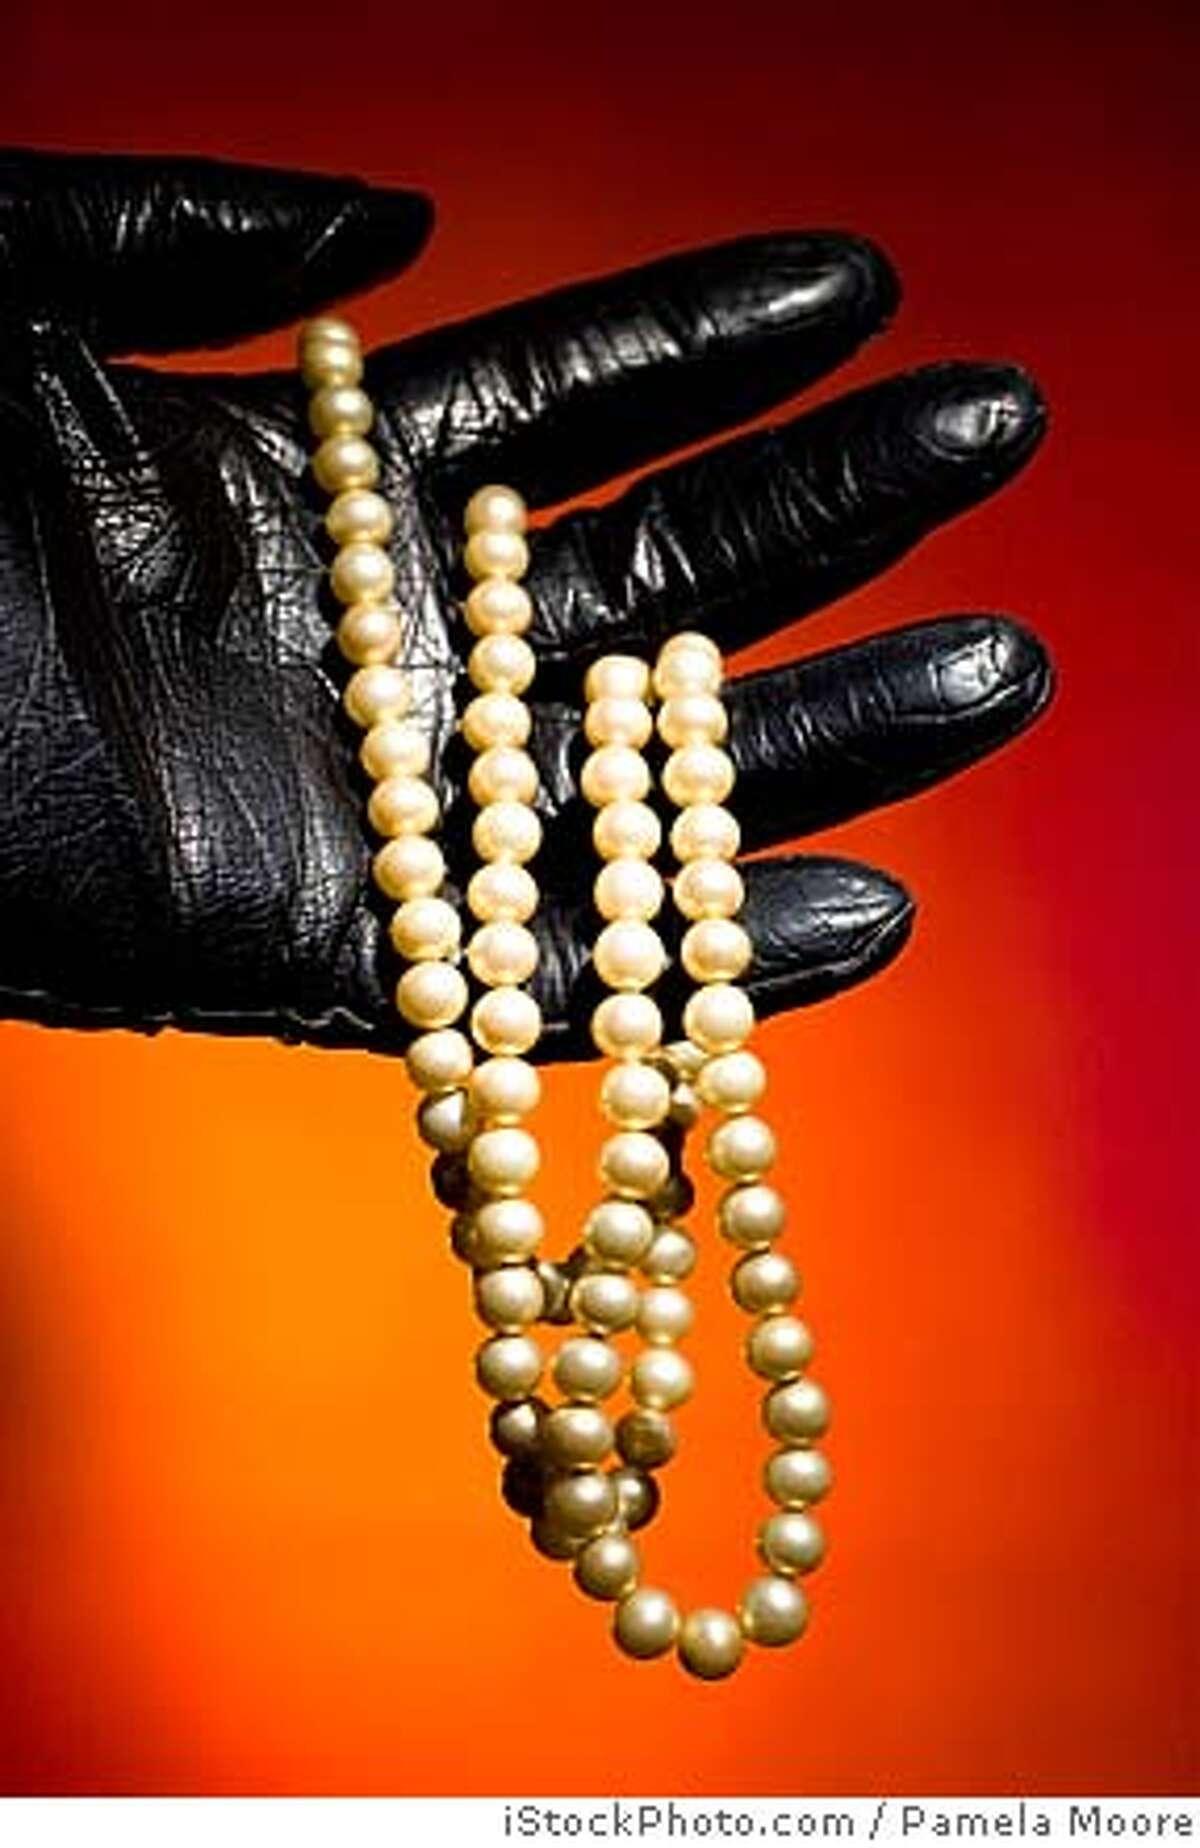 robbery pearls glove burglary Ran on: 12-16-2007 Ran on: 12-16-2007